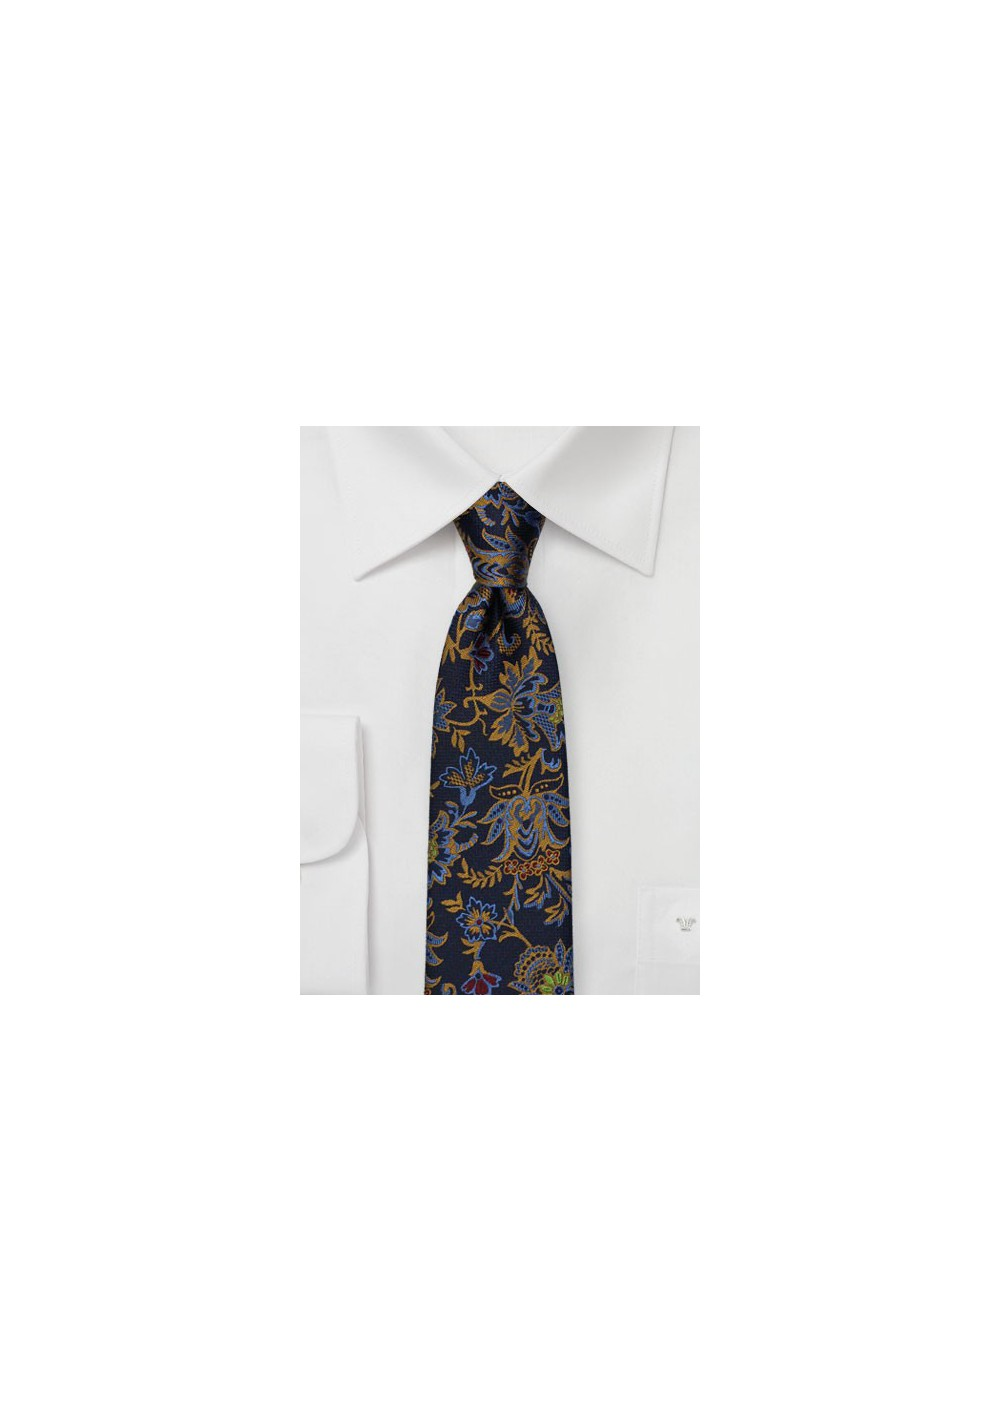 Dark Navy Silk Skinny Tie with Woven Florals in Gold